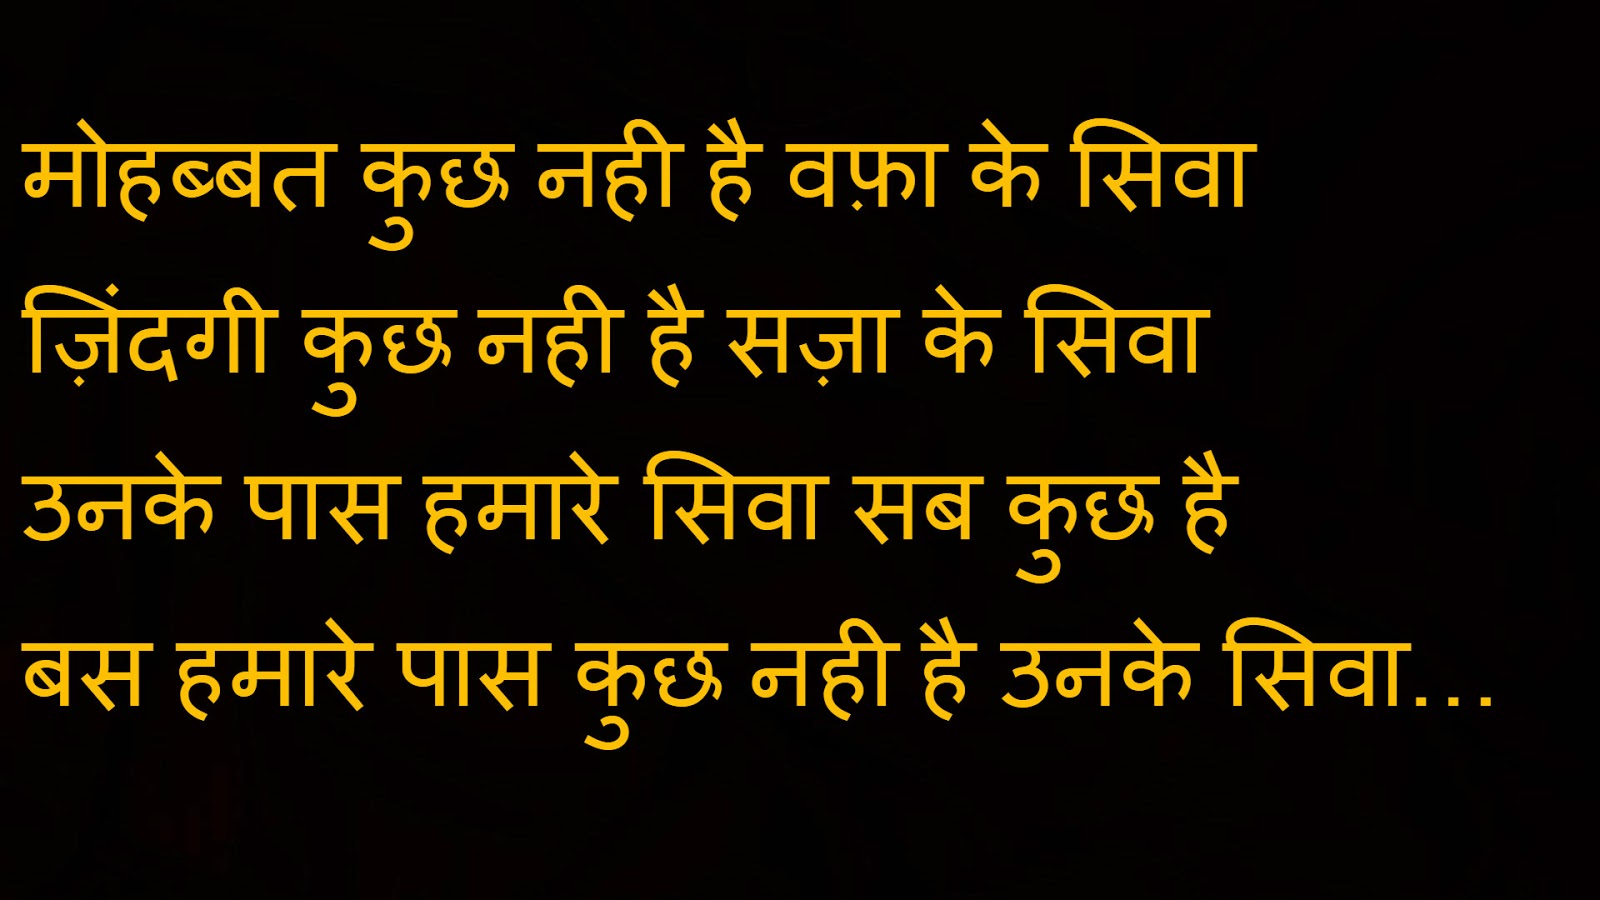 Pyaar ishq aur mohabbat images in hindi tags best funny images shayari best funny jokes images best funny jokes images in hindi best funny jokes images new pyaar ishq aur mohabbat images altavistaventures Choice Image